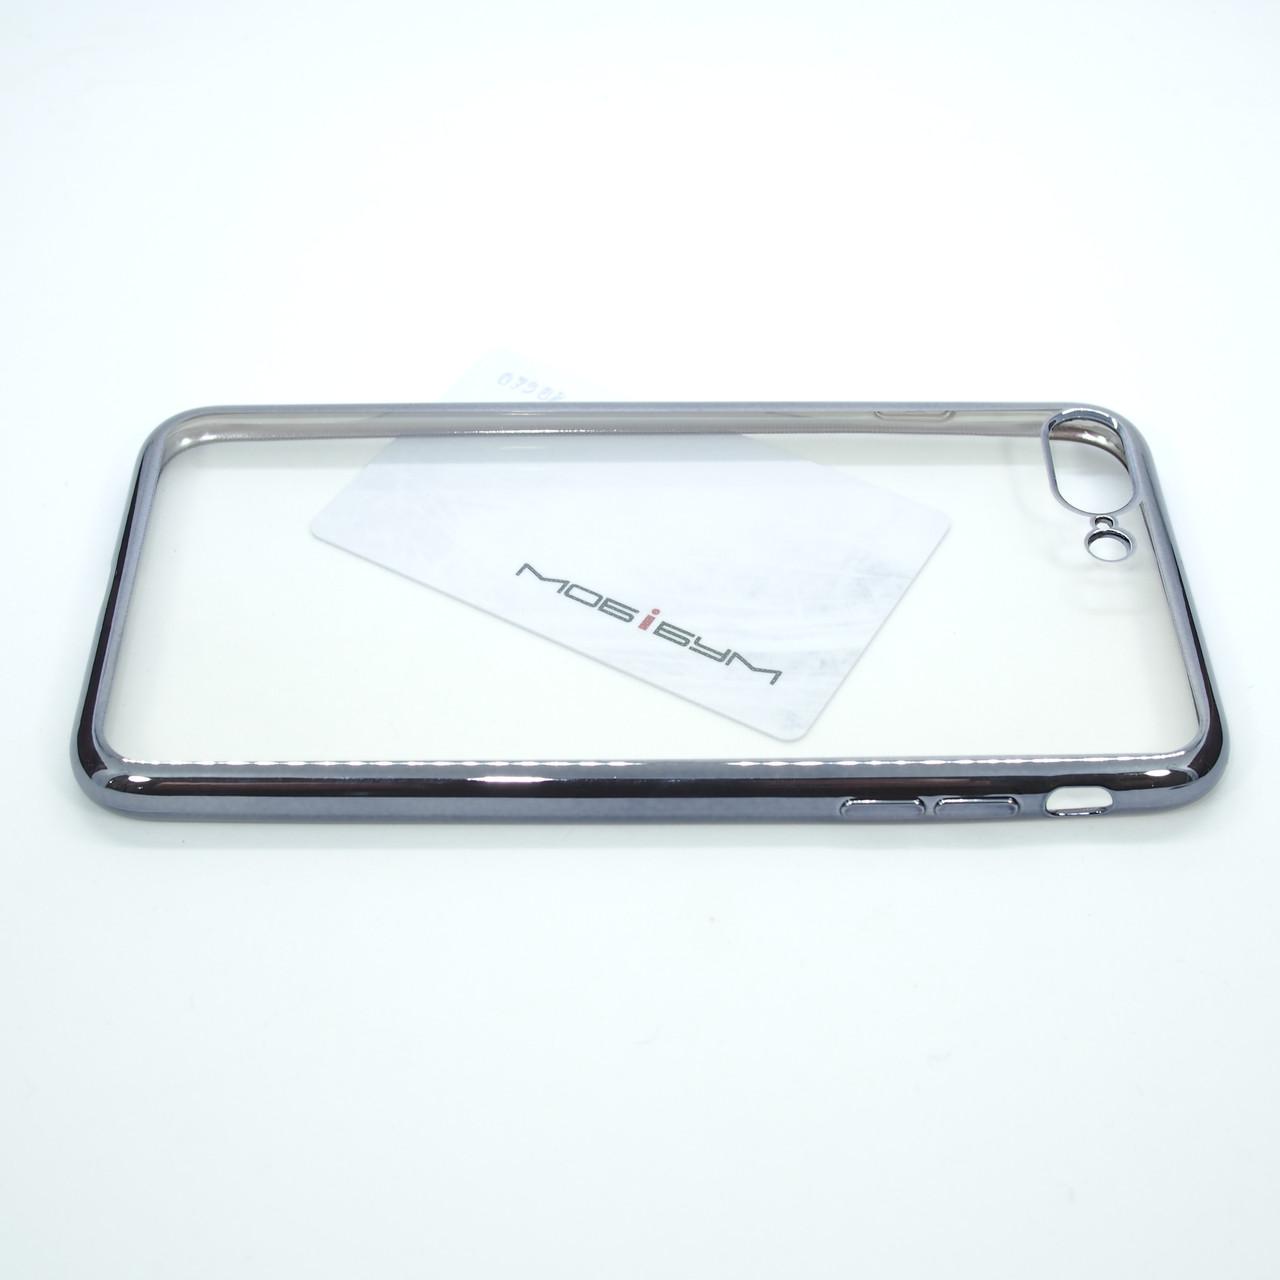 TPU bamper iPhone 8 Plus 7 grey Для телефона Apple Чехол